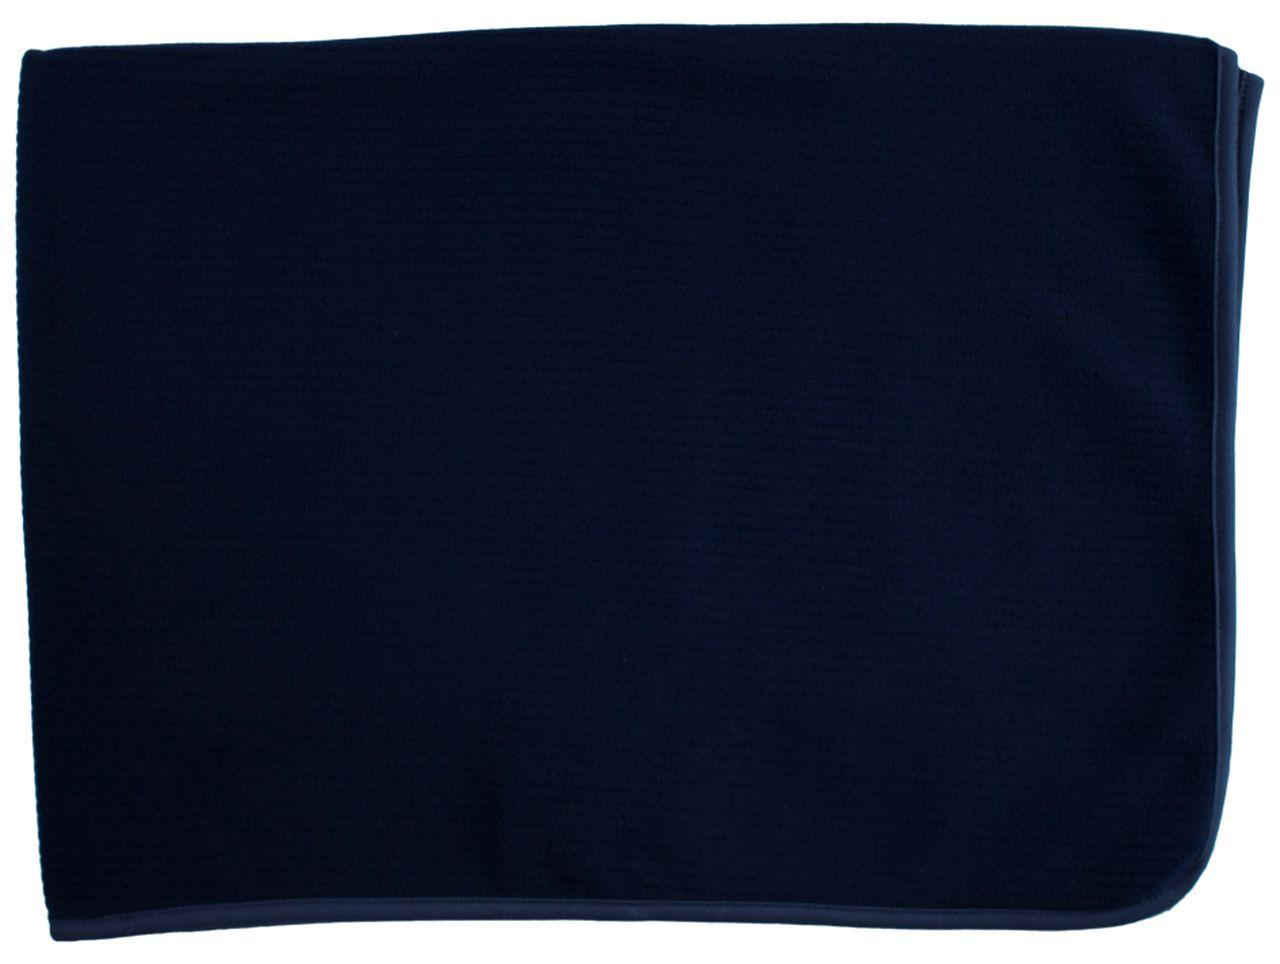 Cobertor Microsoft Canelado  BY BIBE